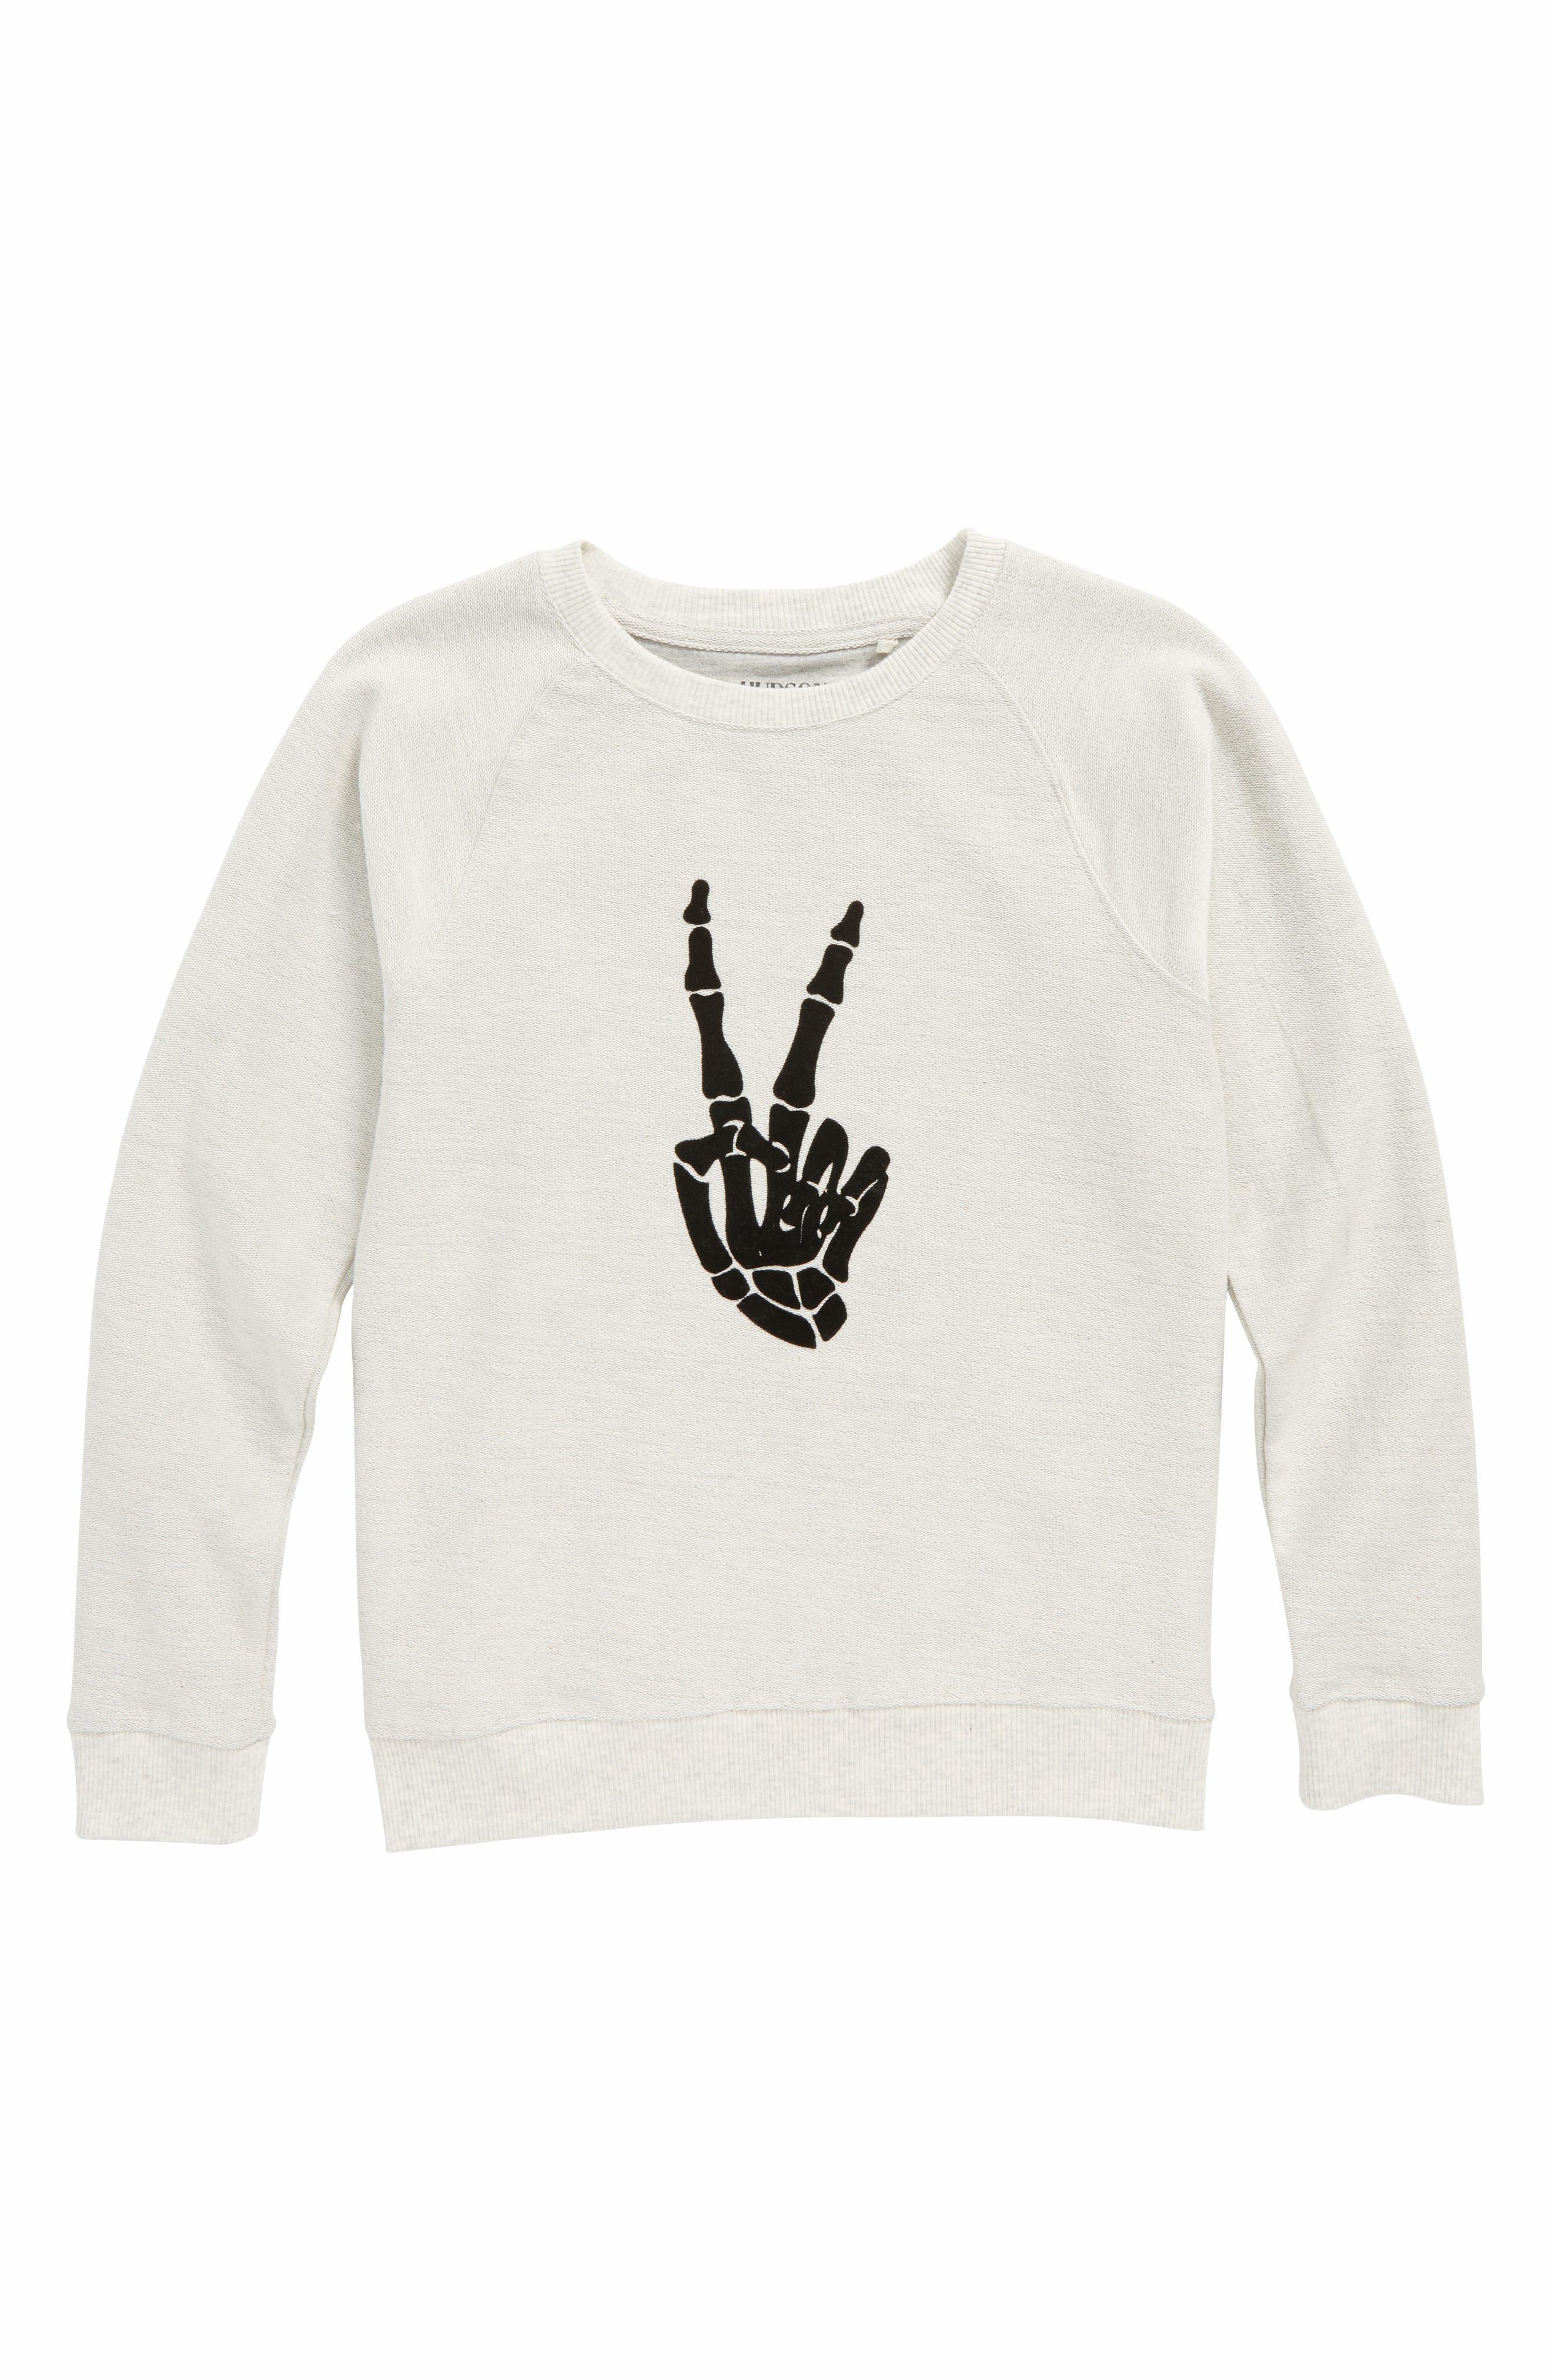 Vibes Graphic Sweatshirt,                         Main,                         color, Quicksilver